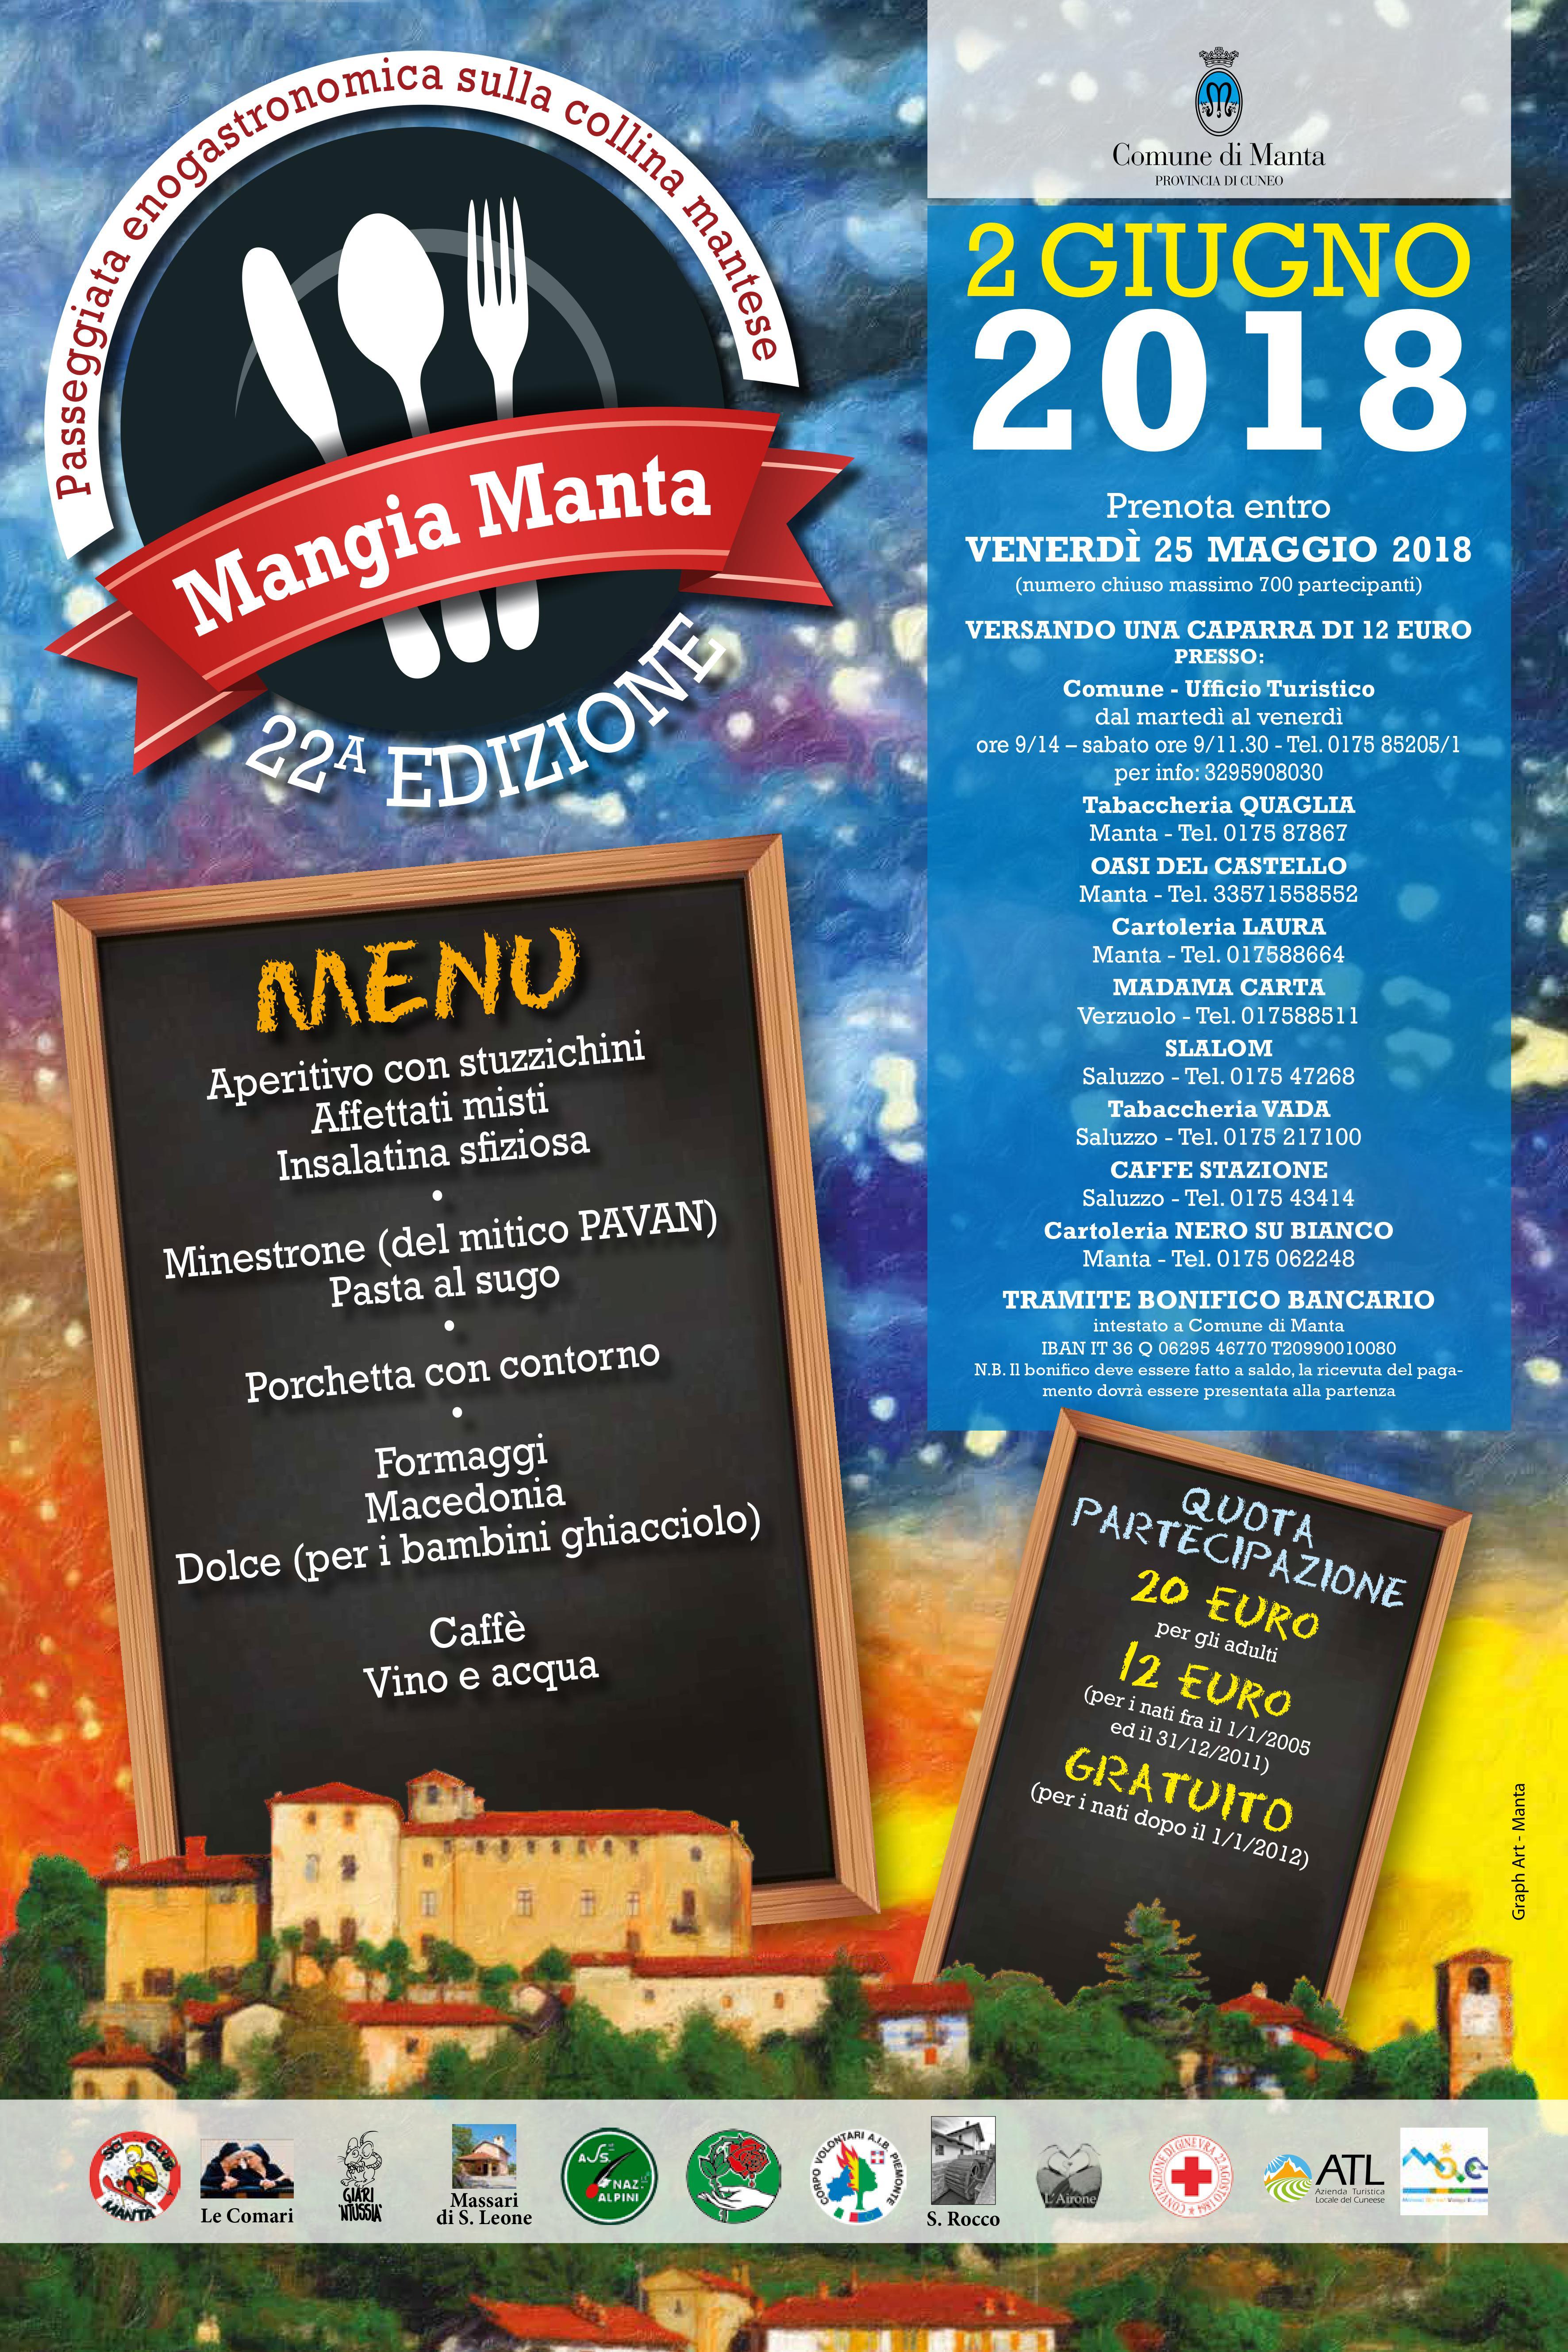 locandina Mangia Manta 2018 mail